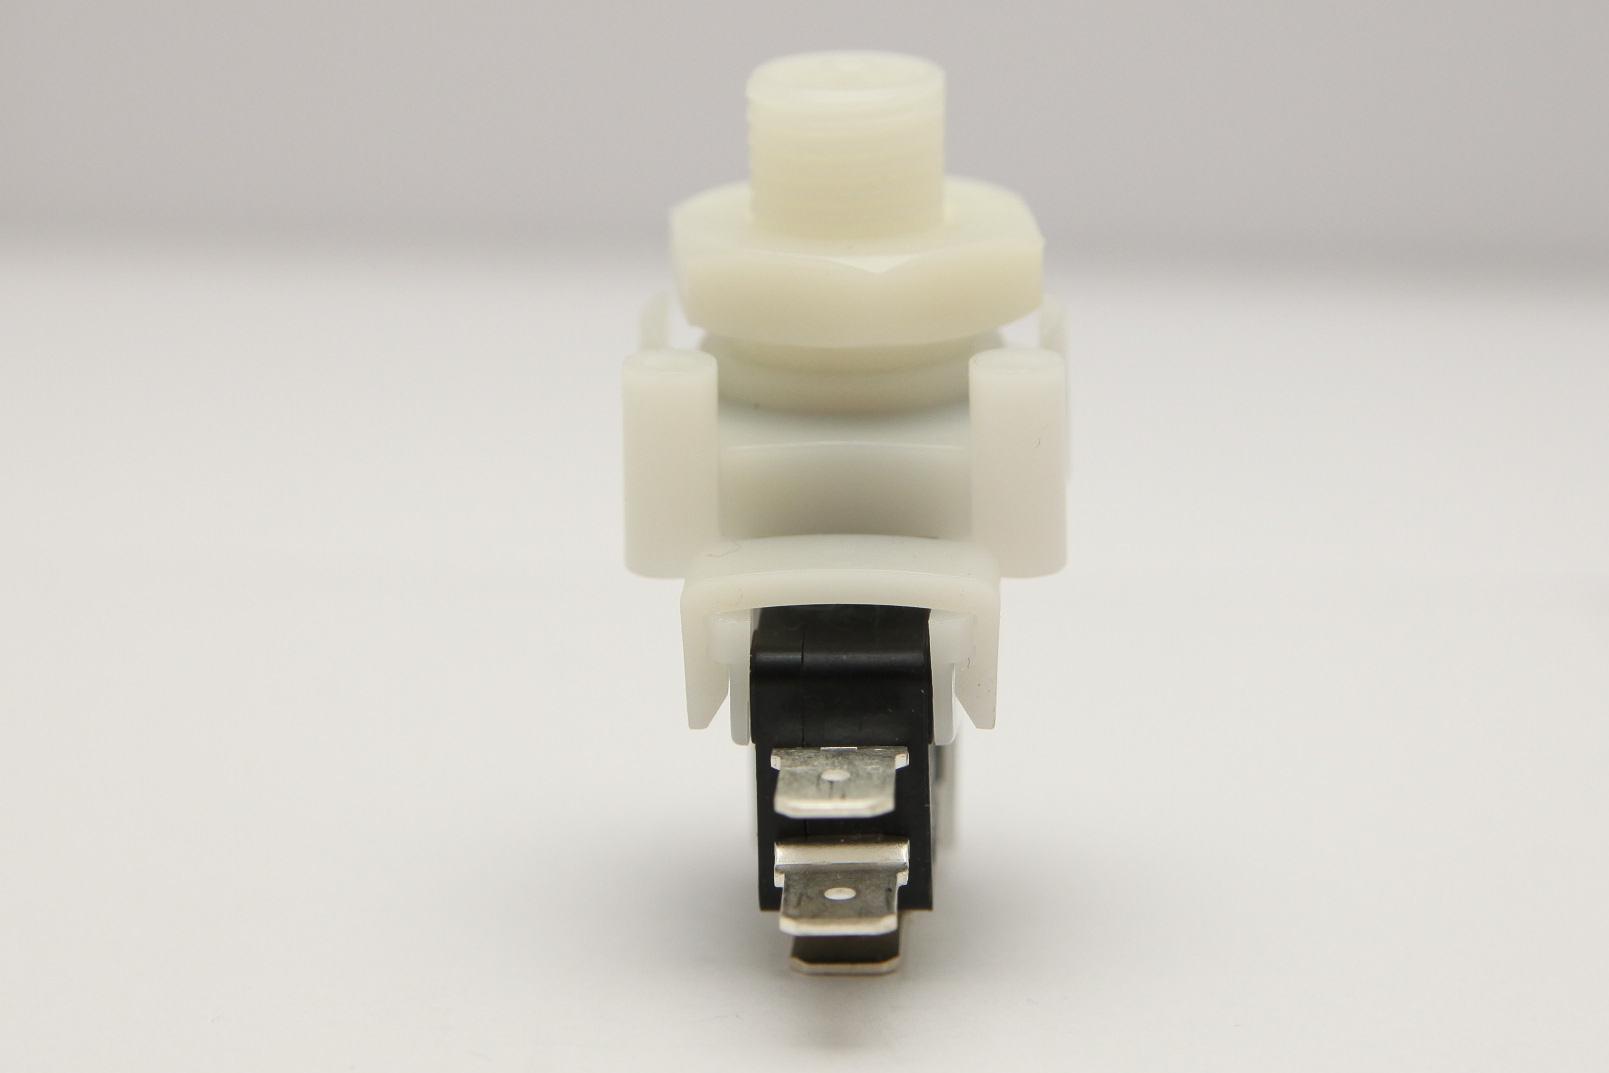 Tinytrol Miniature Switch